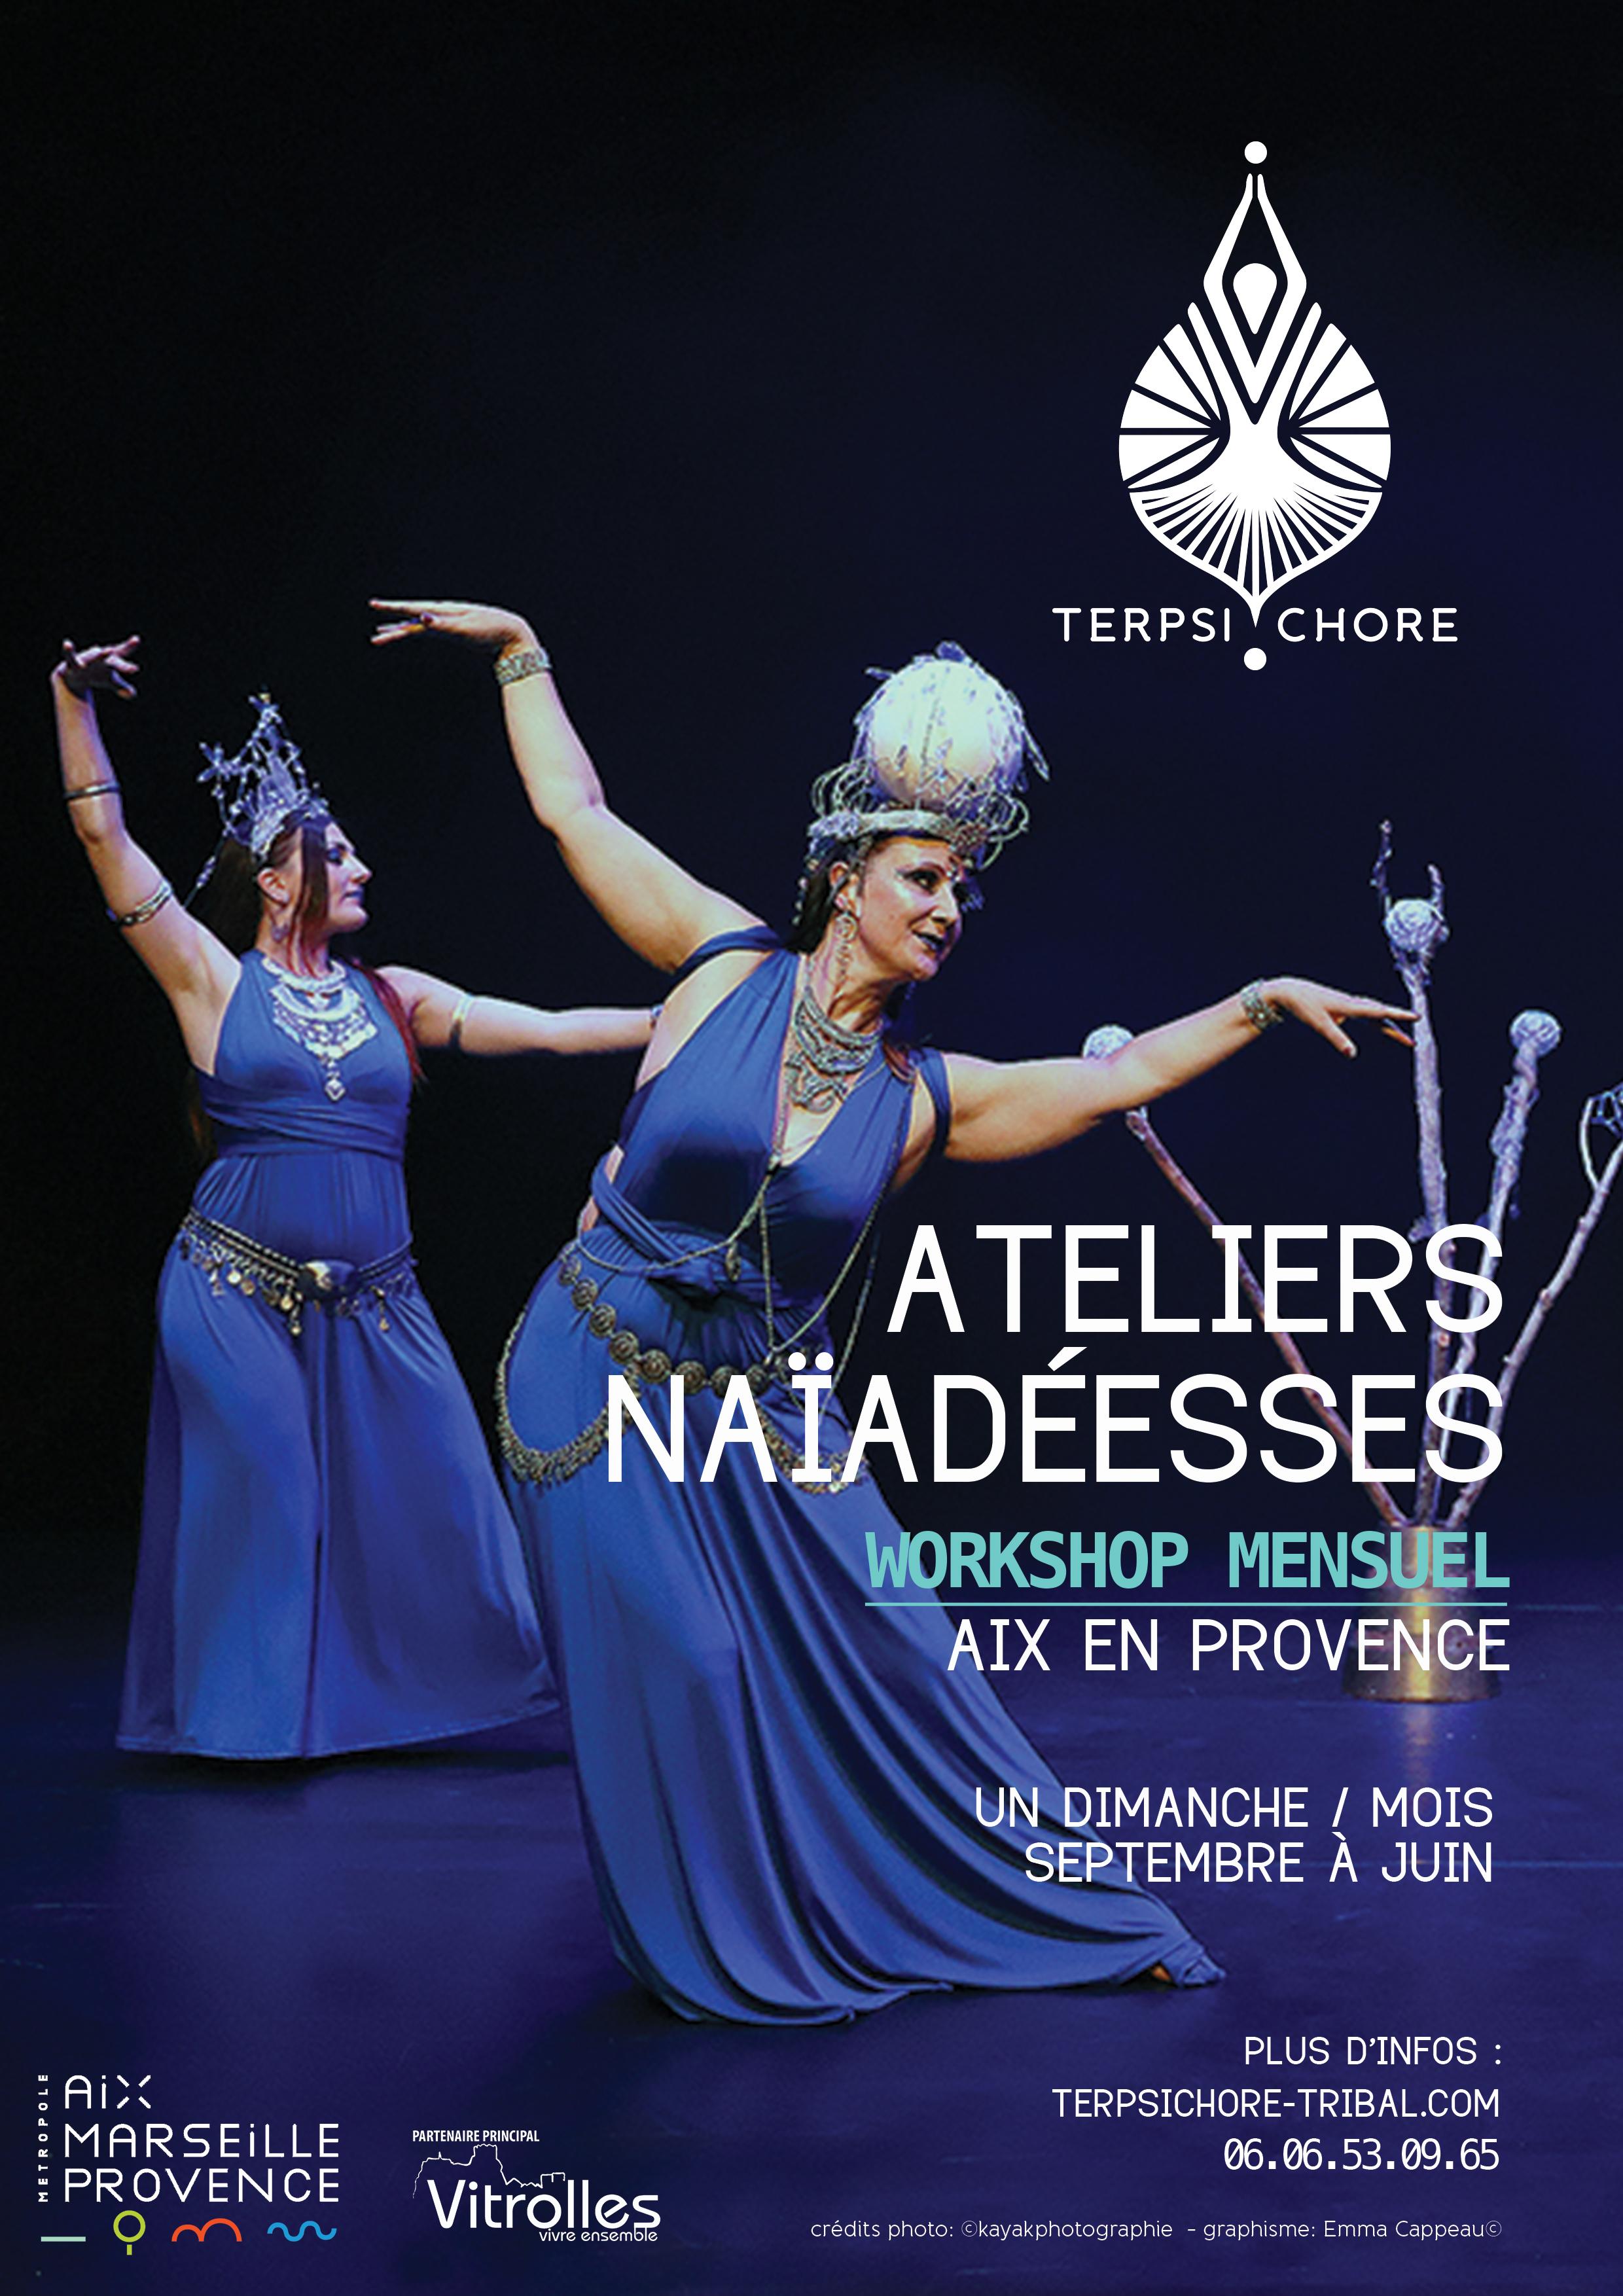 Terpsichore---Affiche-Naiadeesses-2018